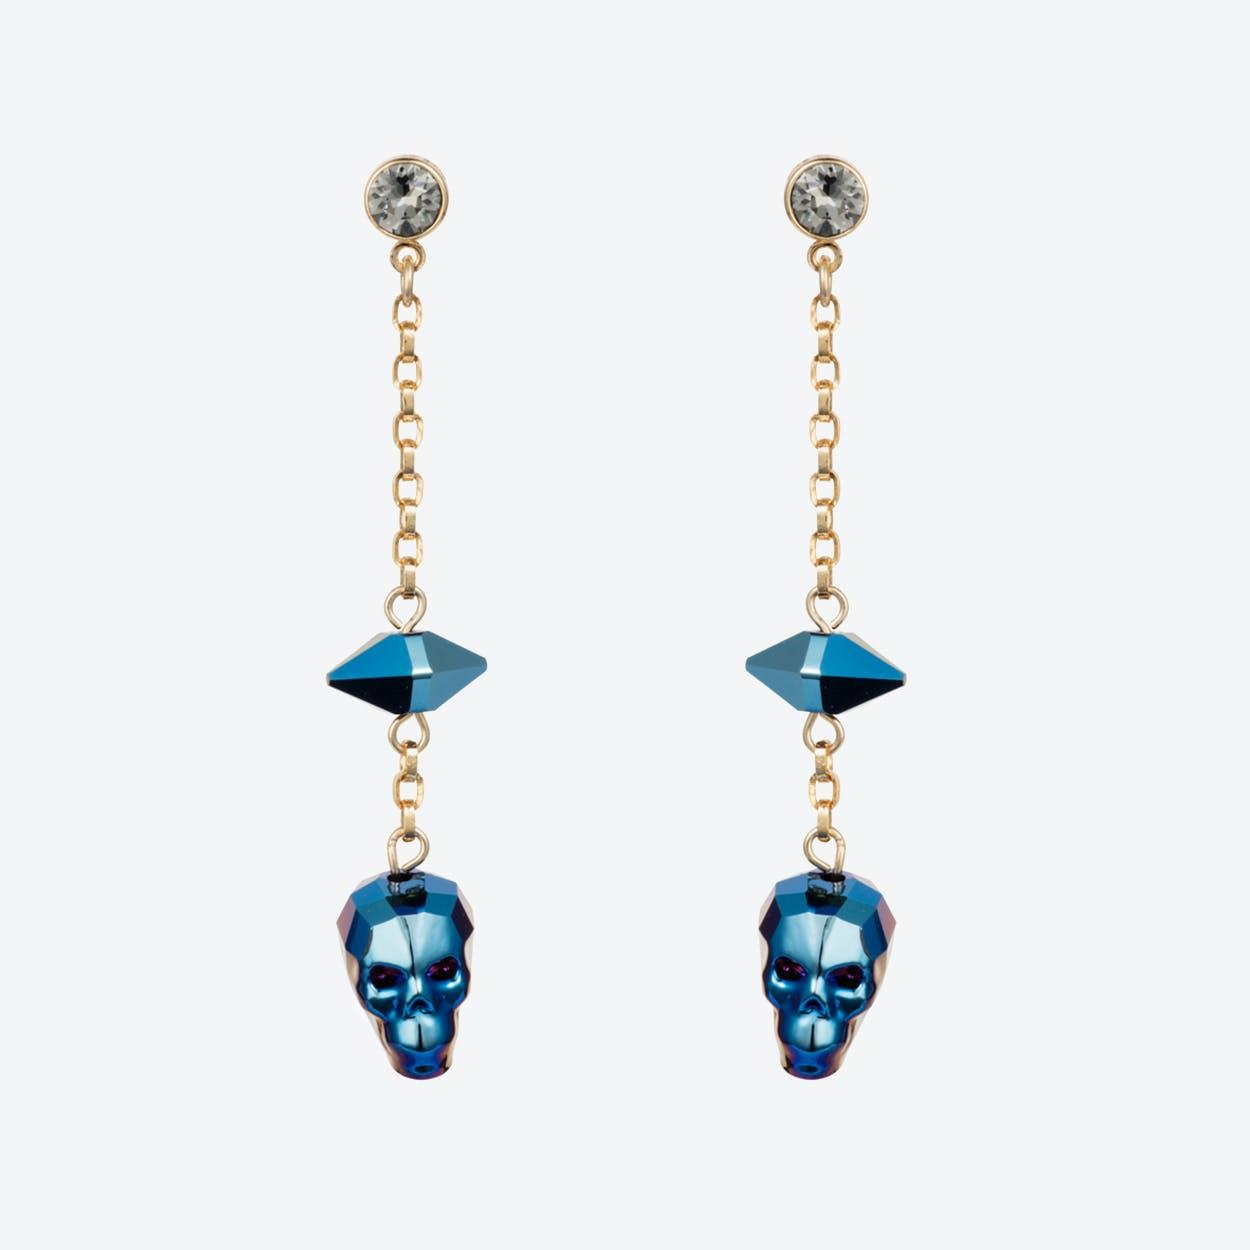 Crystal Skull & Spike Earrings – Metallica Blue